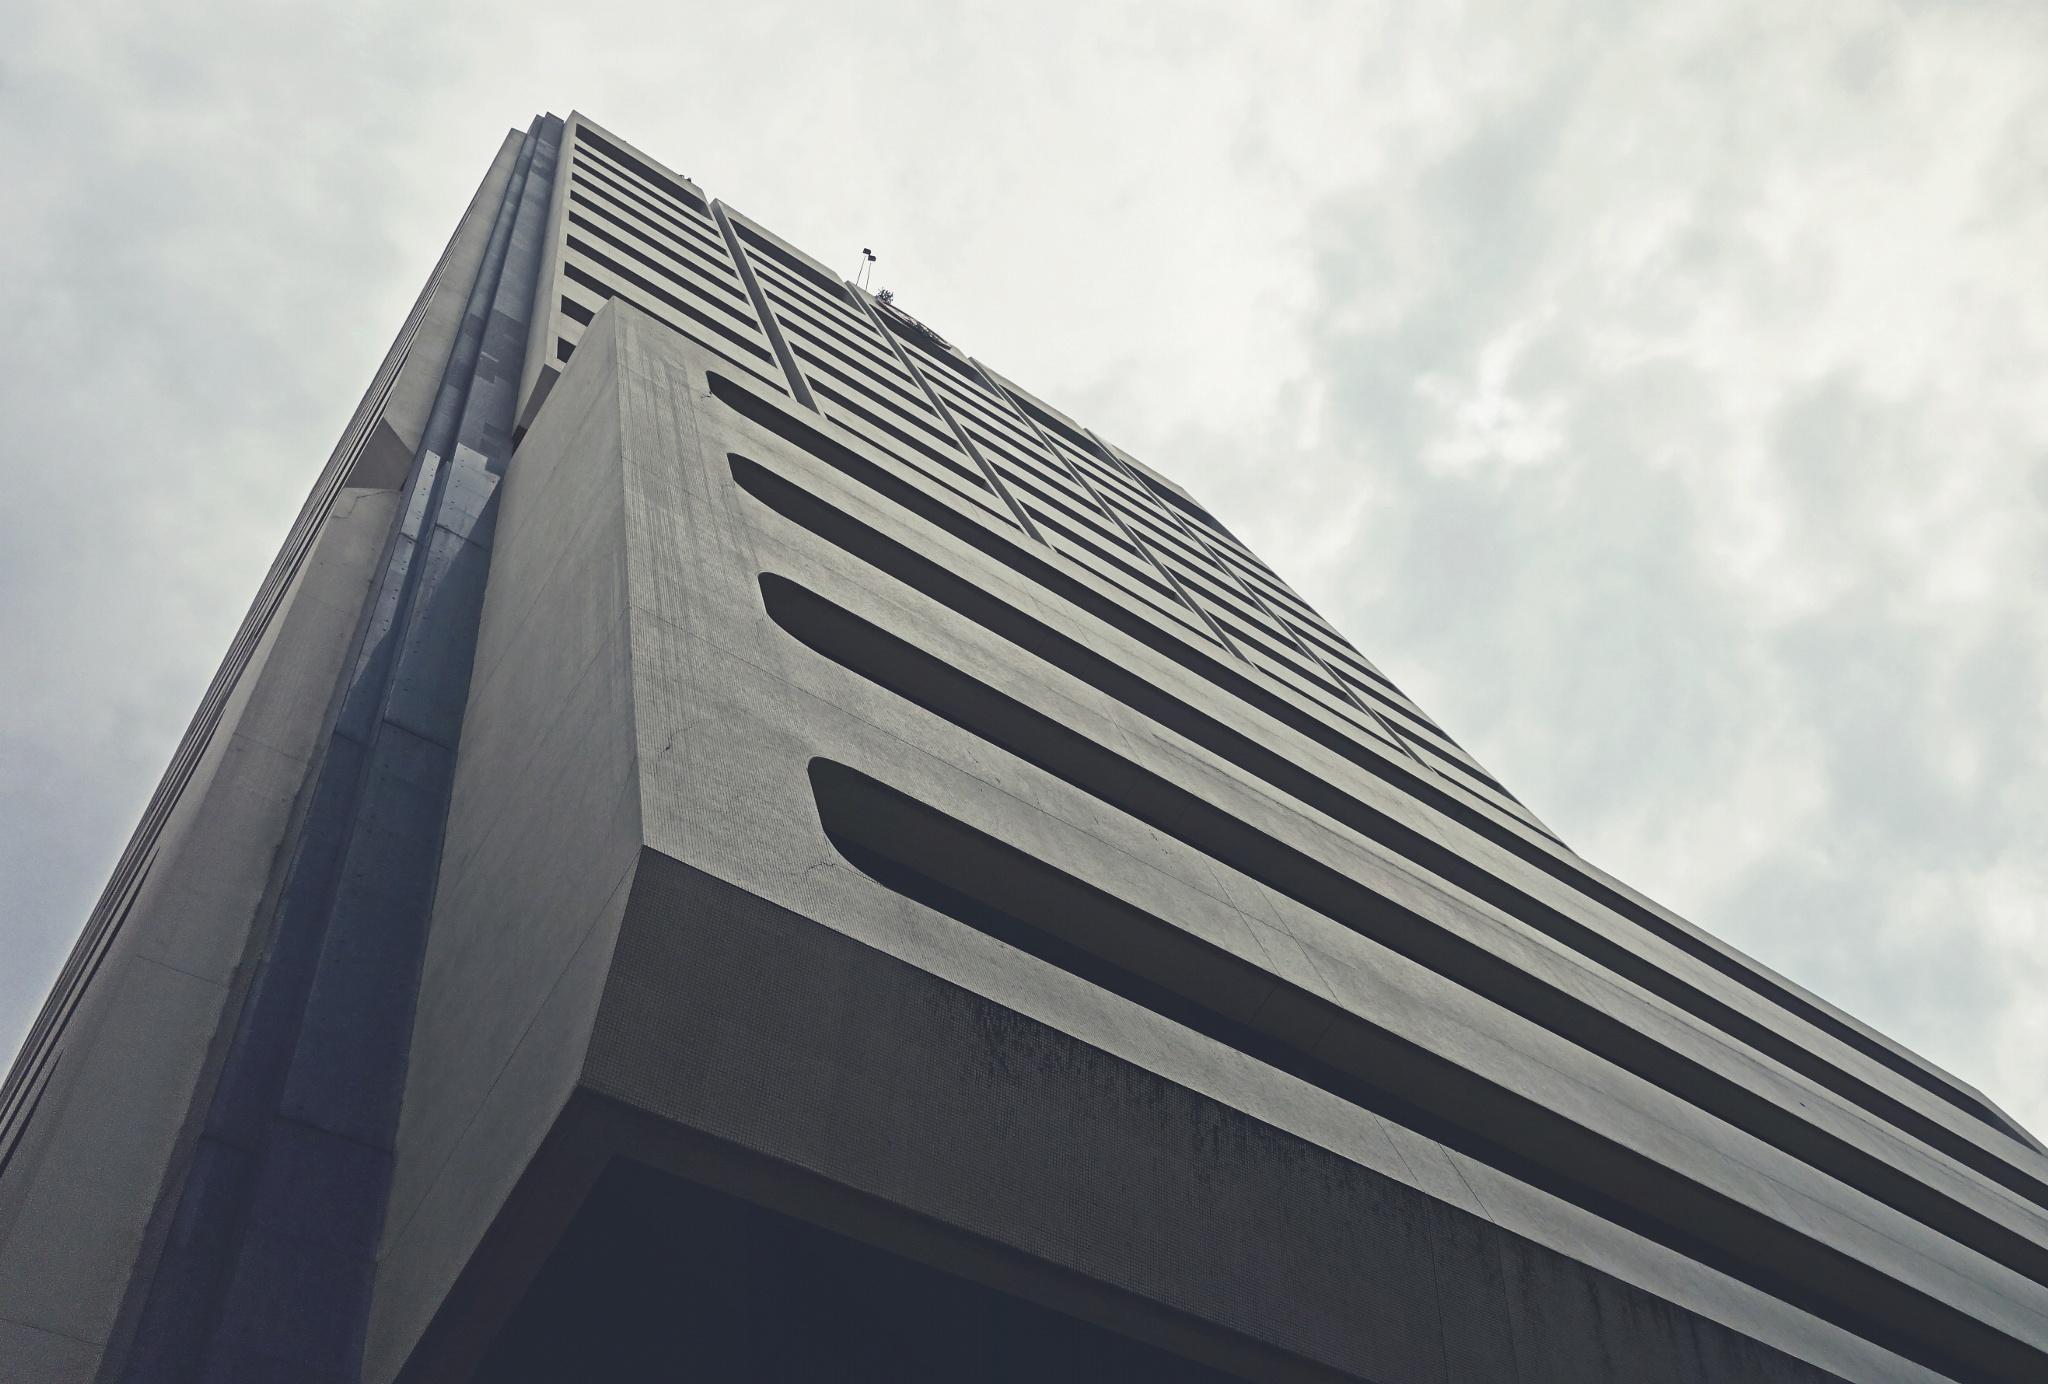 Big Bank by Igor Ovsyannykov